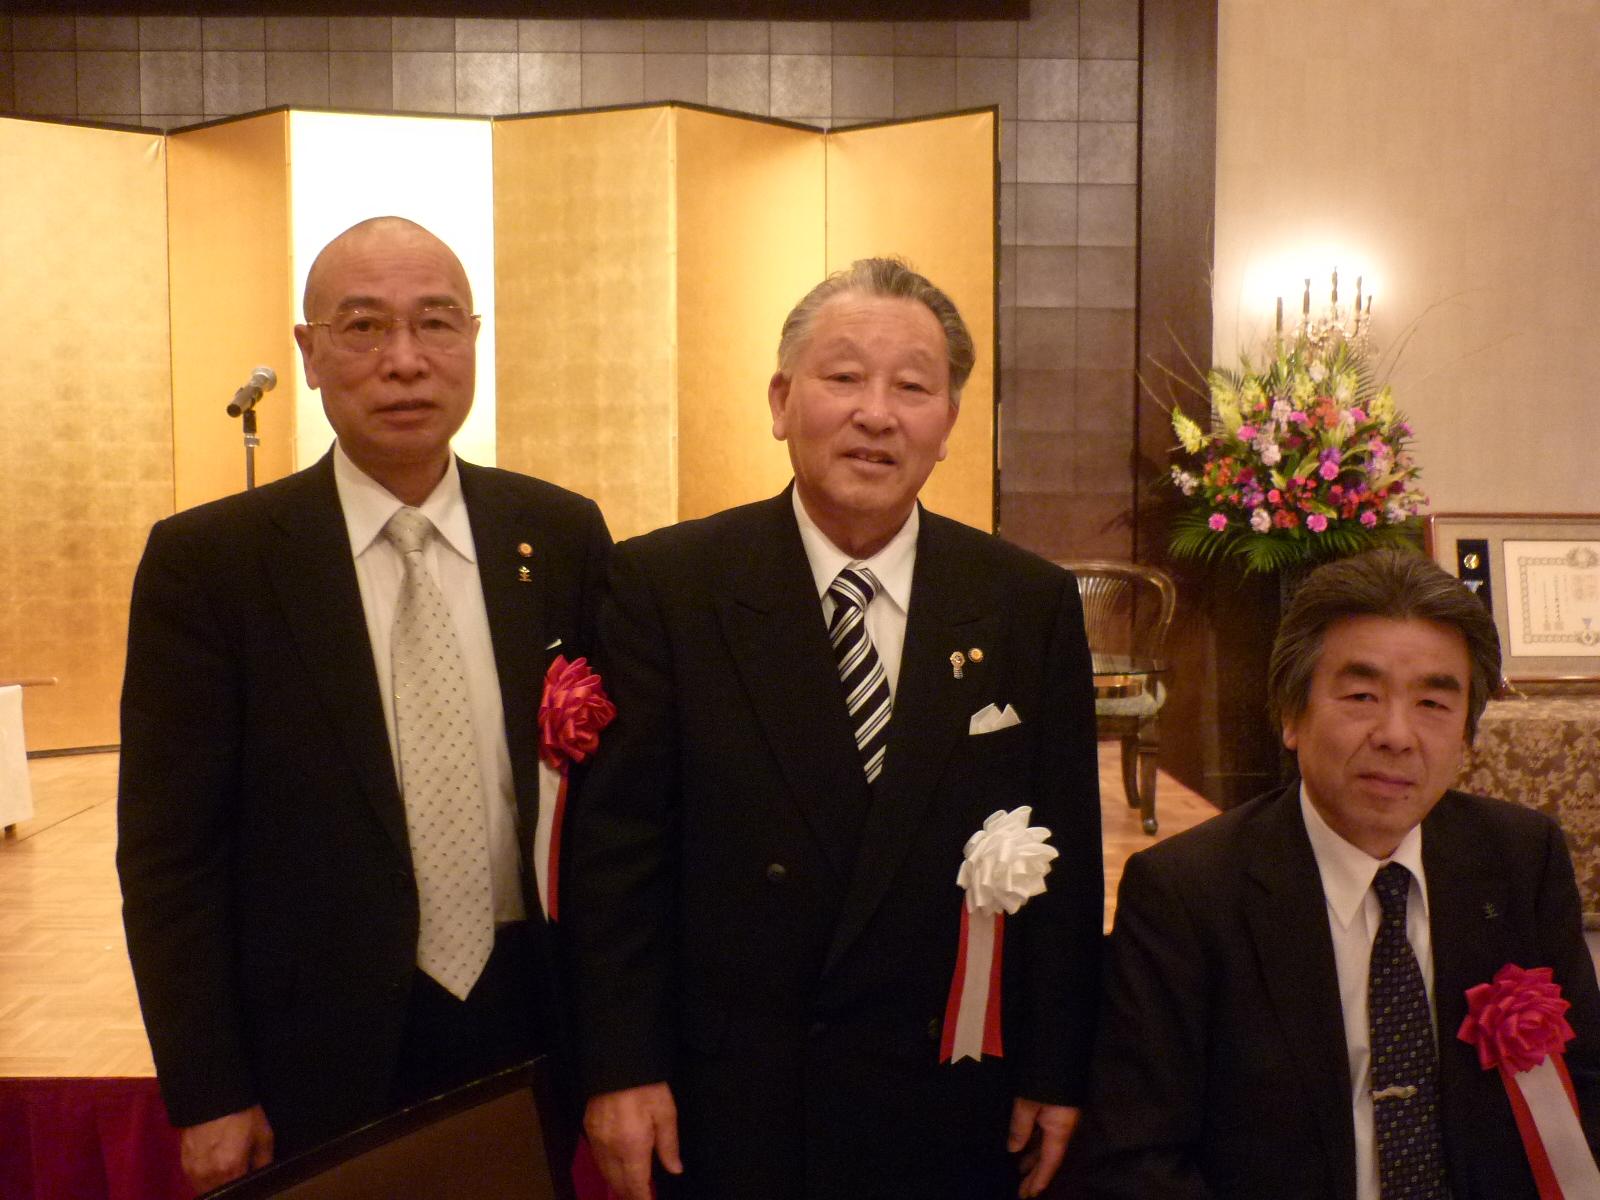 松本アルプスLC・L.二木 昇 瑞宝双光章受章祝賀会